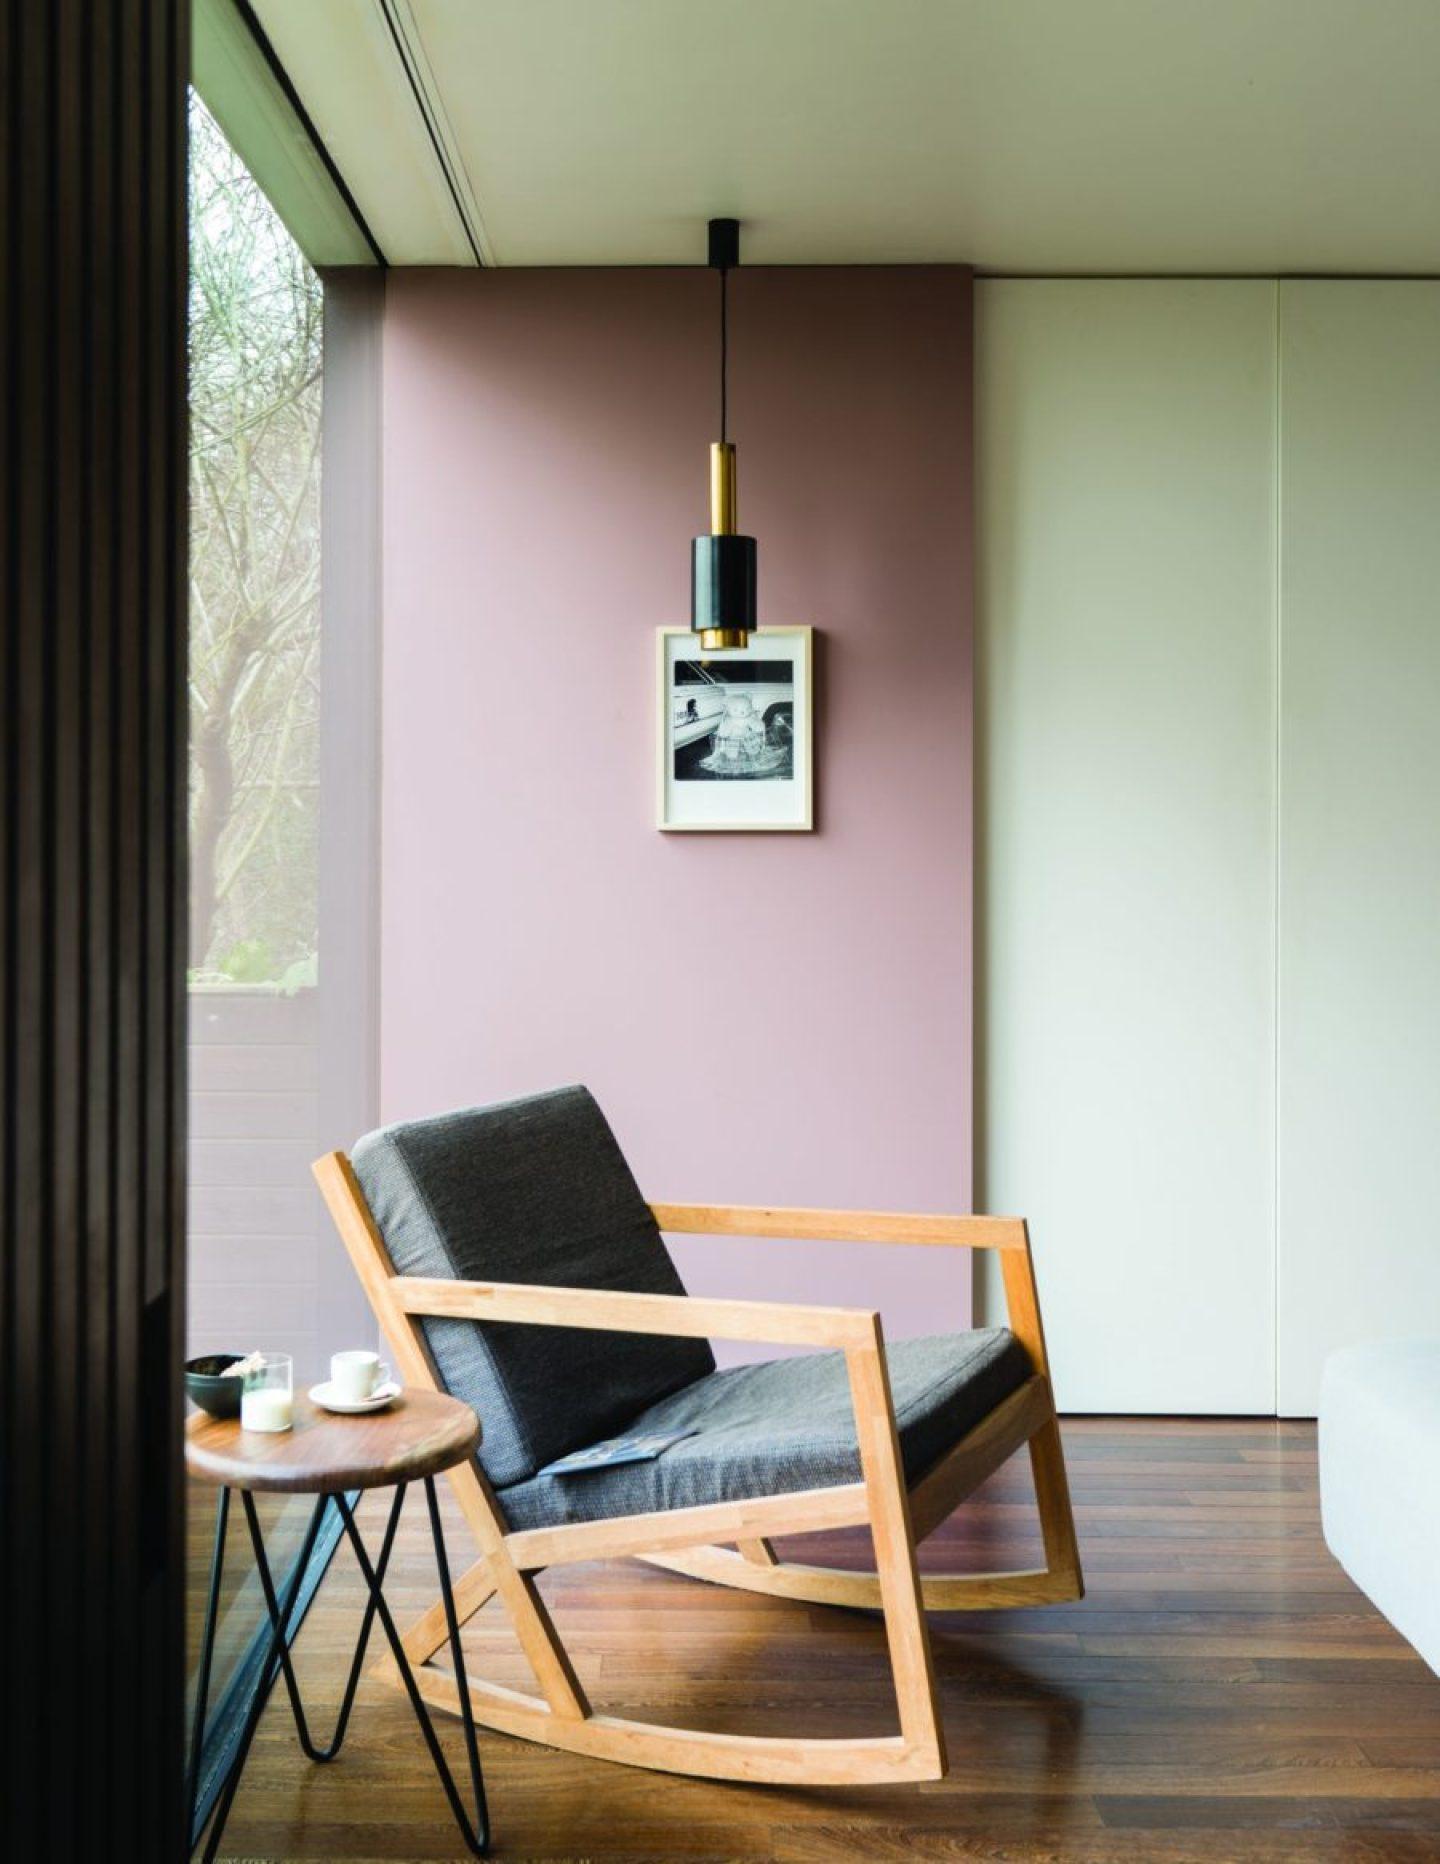 FarrowBall_2604512_SulkingRoomPinkNo295-2.jpg-2-1440x1864 Paint Inspiration: 20 Colorful Rooms We Love